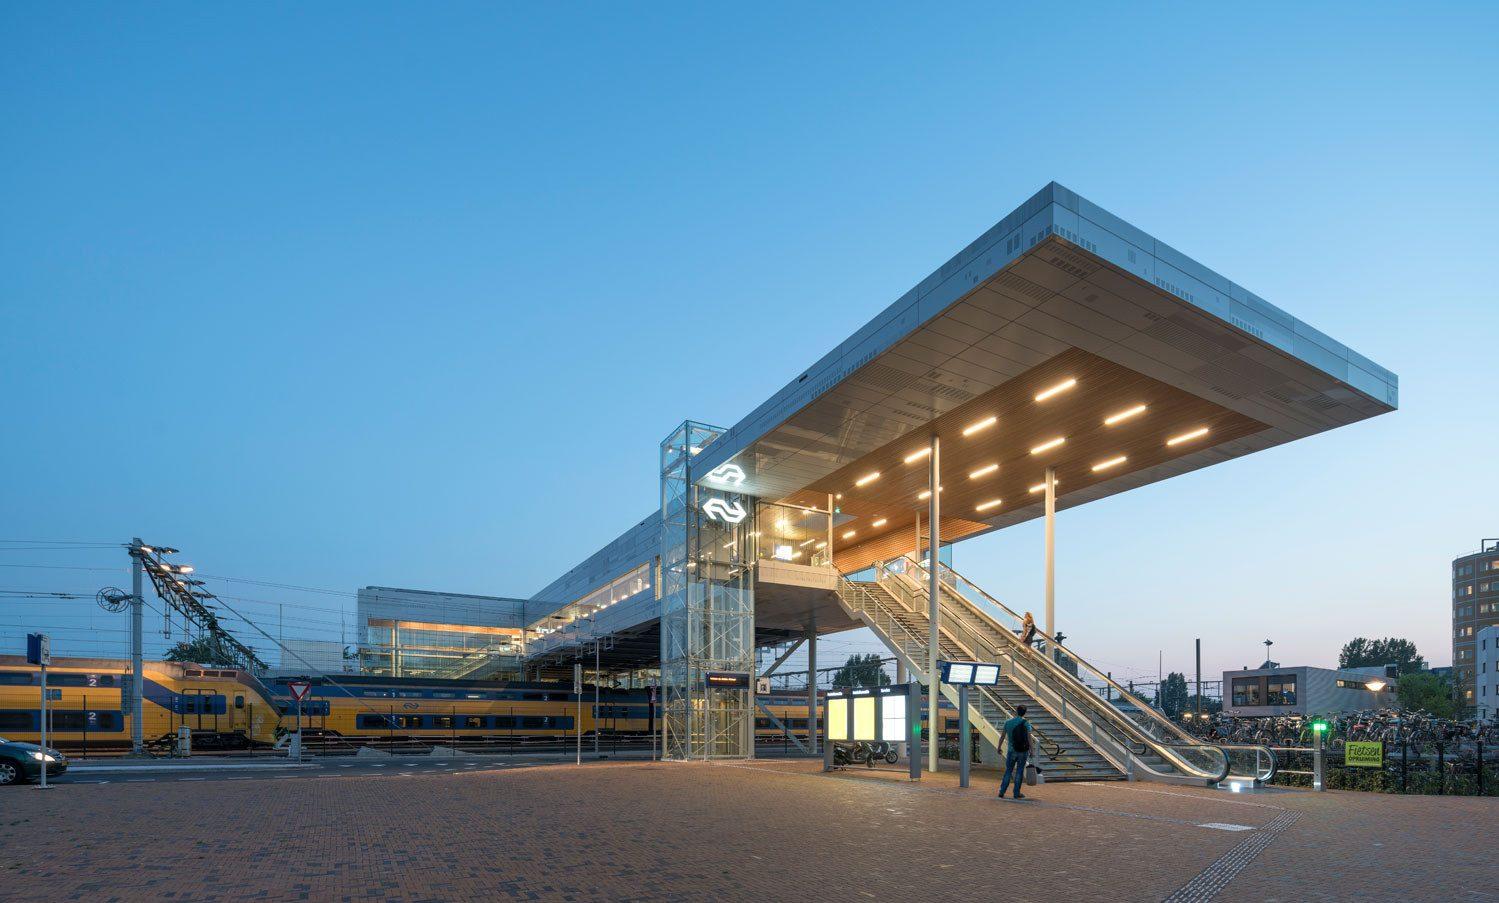 Het station in Alkmaar voorzien van MD Strekmetaal gevelbekleding